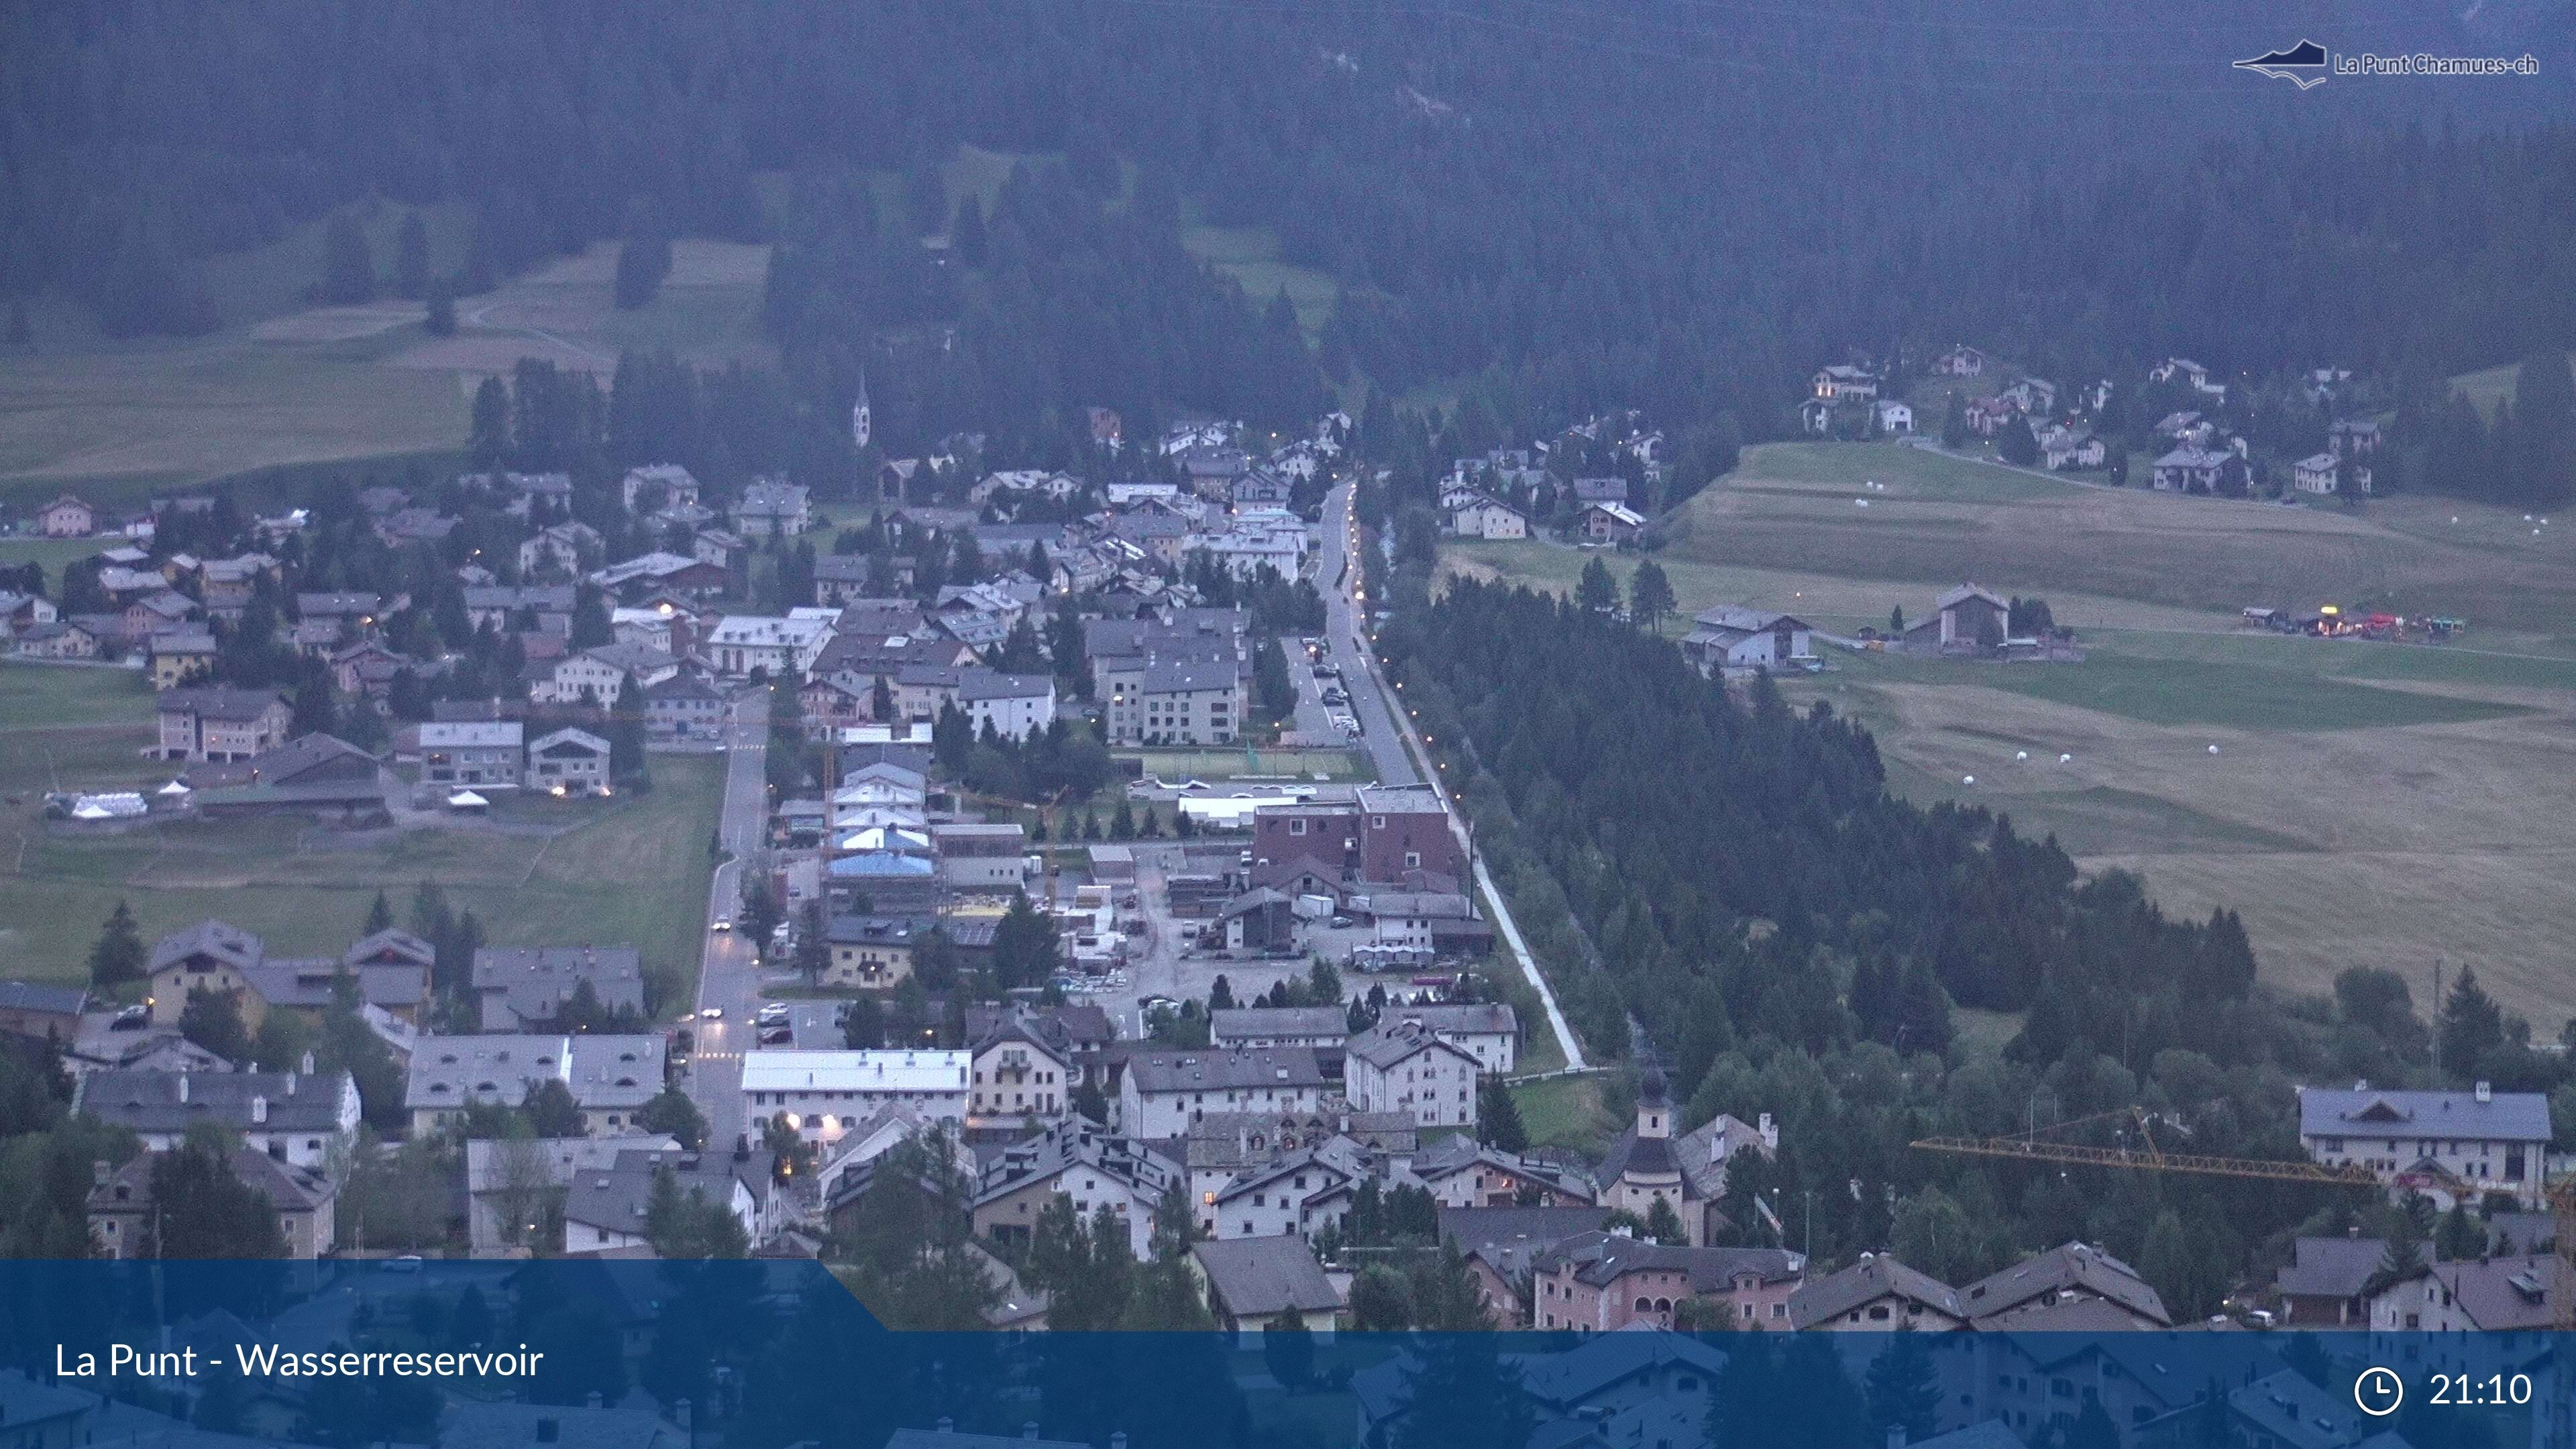 La Punt: Wasserreservoir - Sportplatz